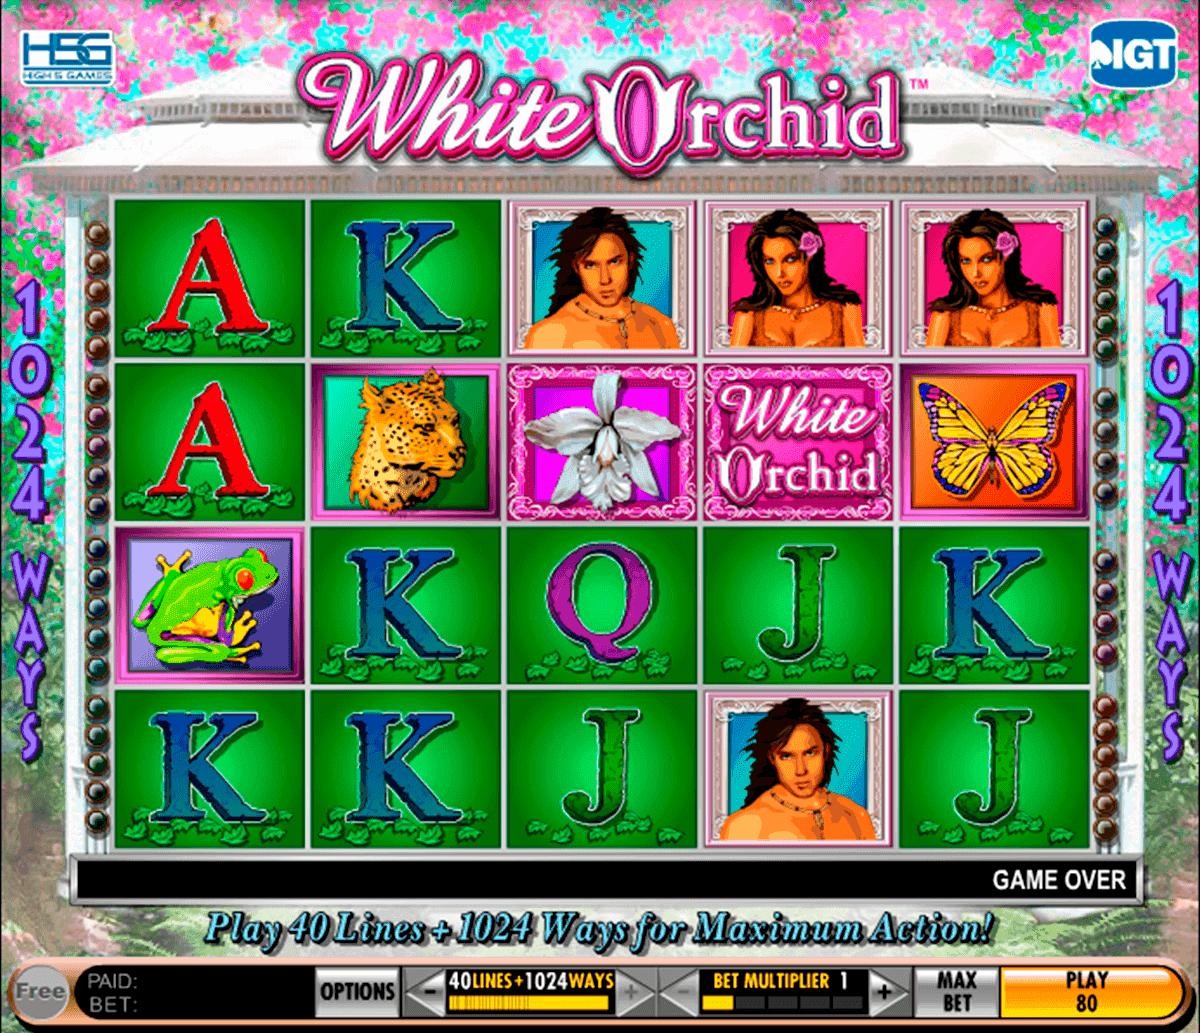 White orchid slot machine online free